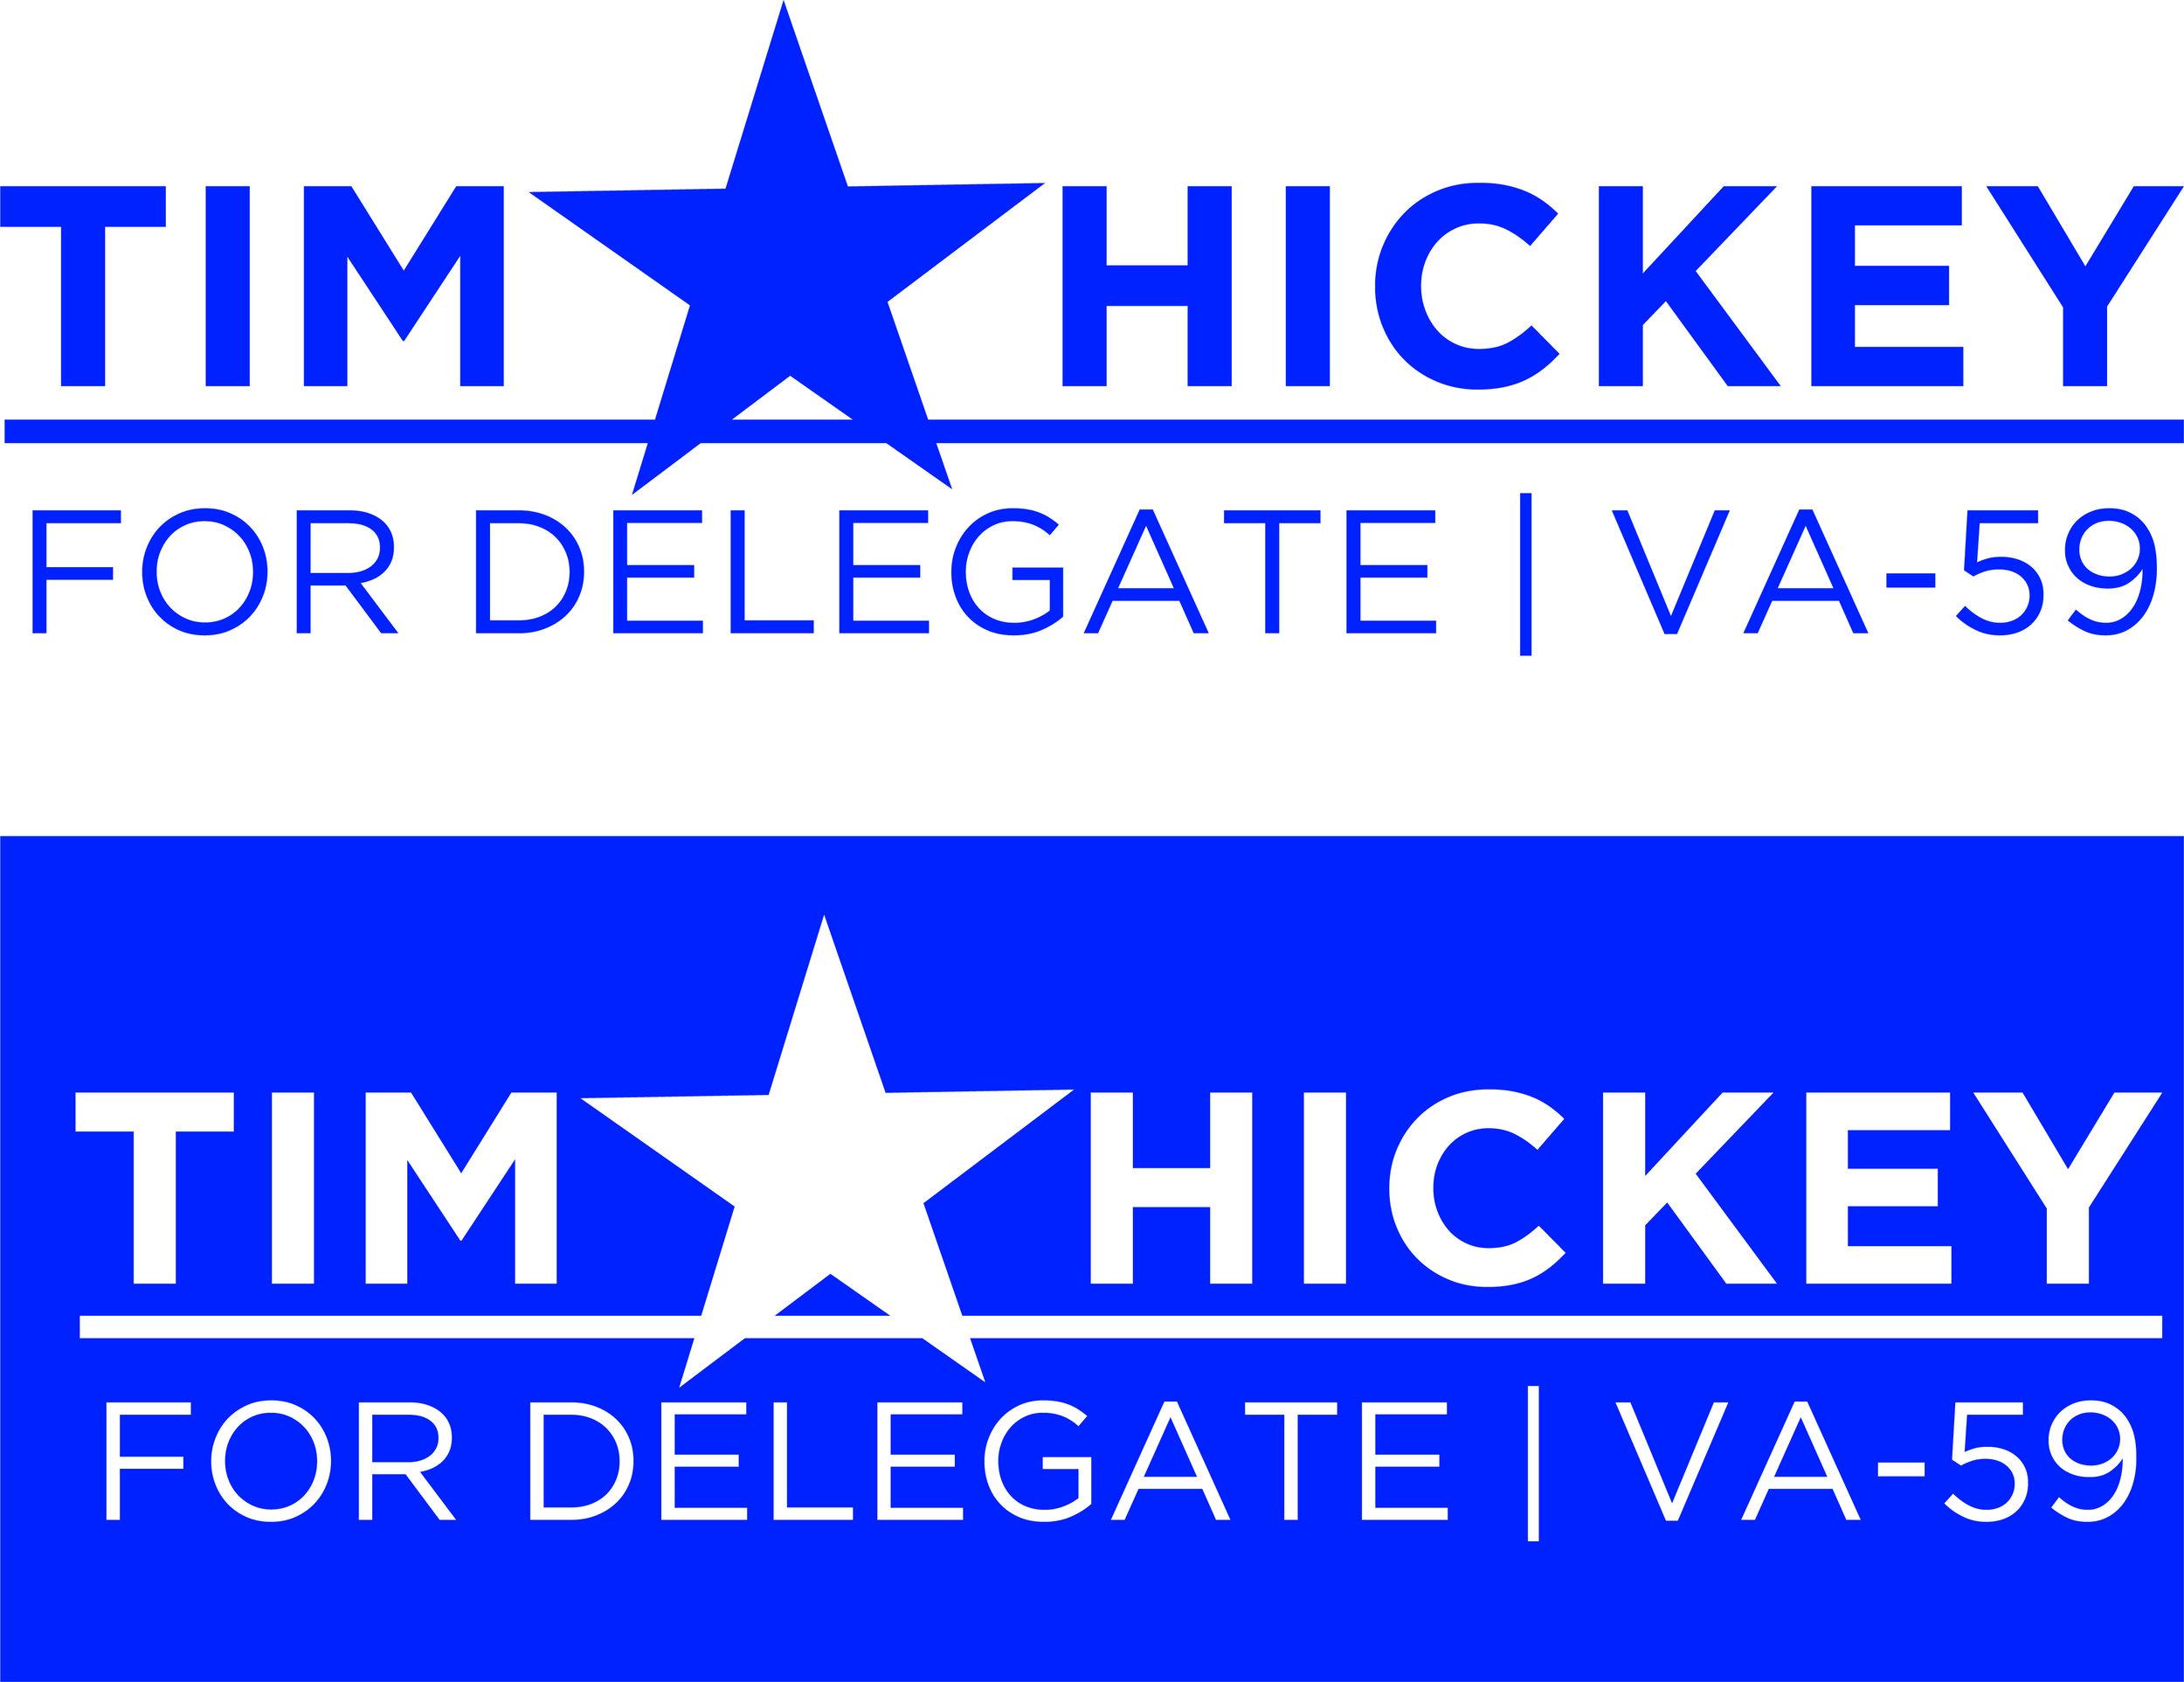 hickey - logos - vcart.jpg